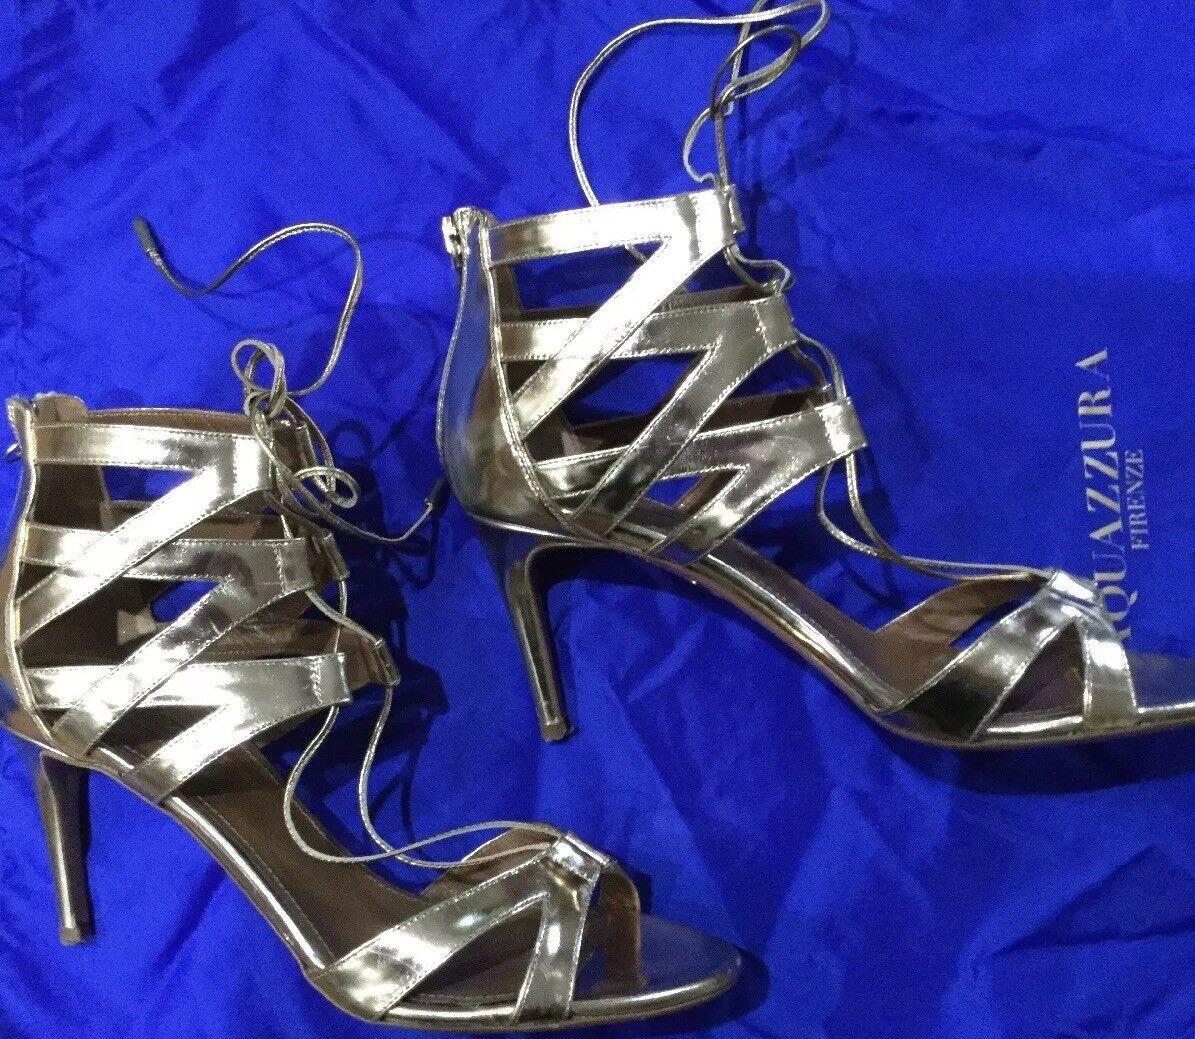 AQUAZURRA Beverly Hills Hills Hills 75 Metallic guld Sandals Storlek 8.5  IT 39 MSRP  750  Vi levererar det bästa